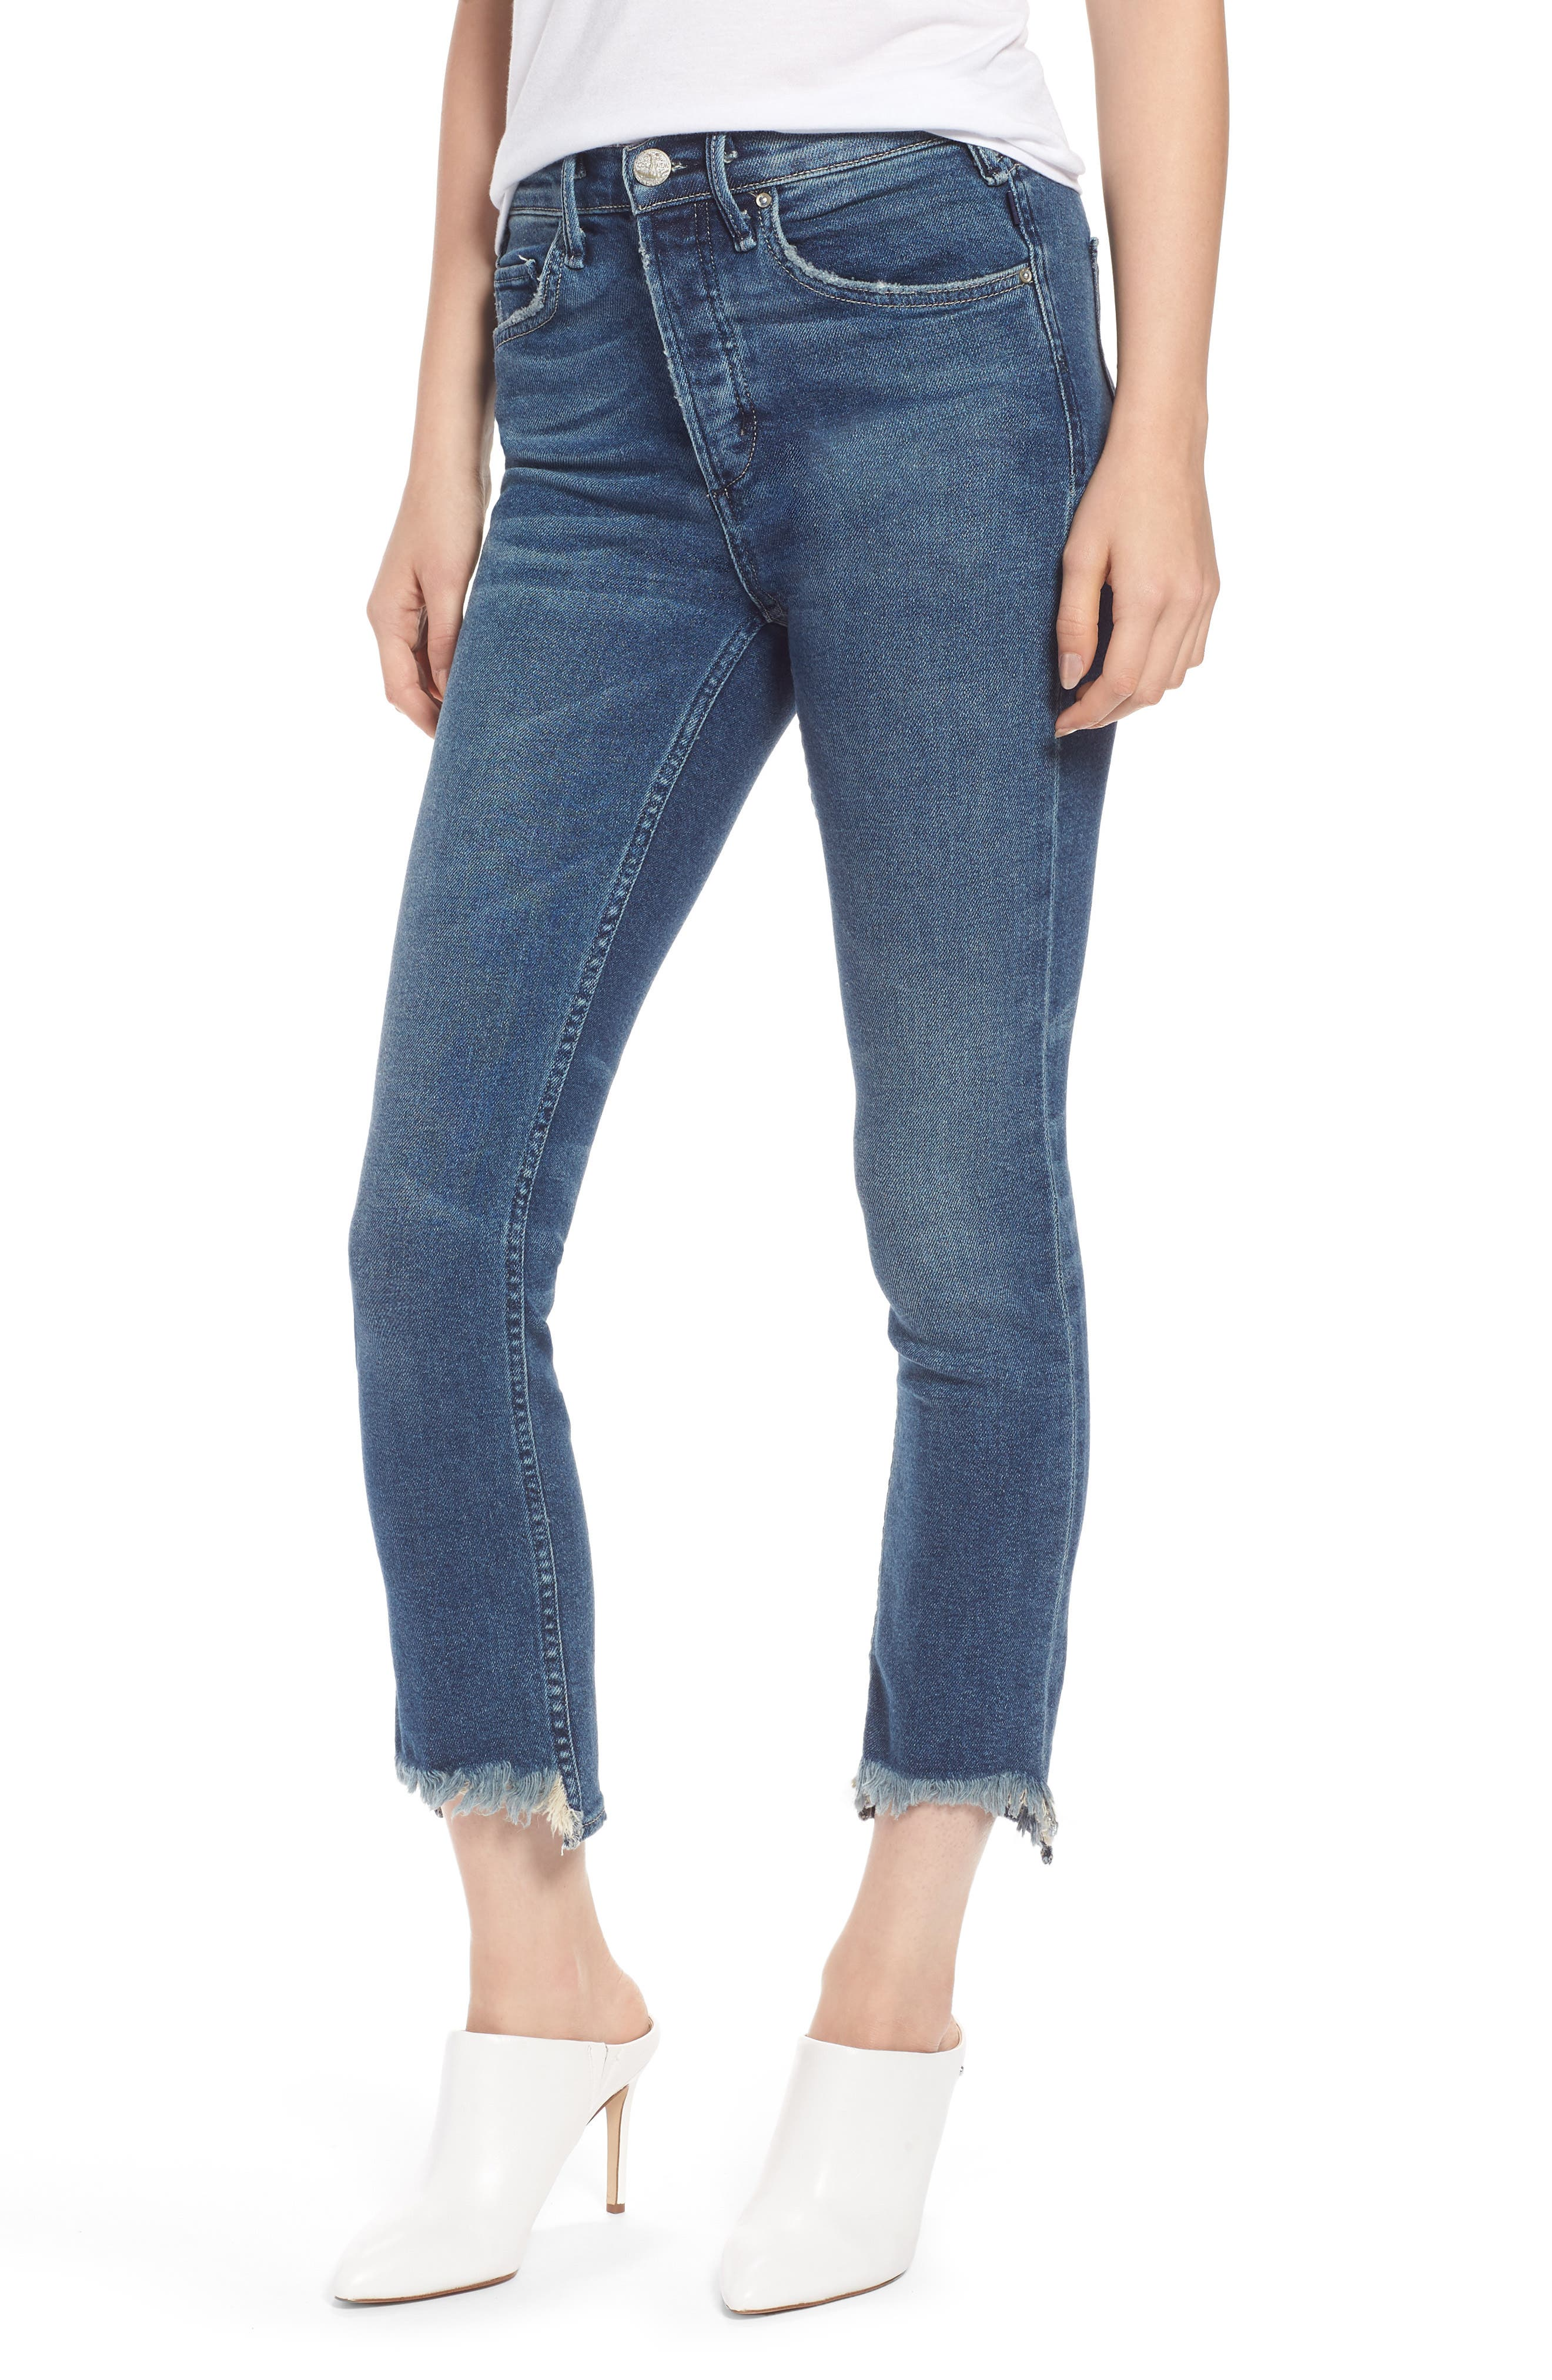 Valetta High Waist Crop Straight Leg Jeans,                             Main thumbnail 1, color,                             WAY UP NORTH